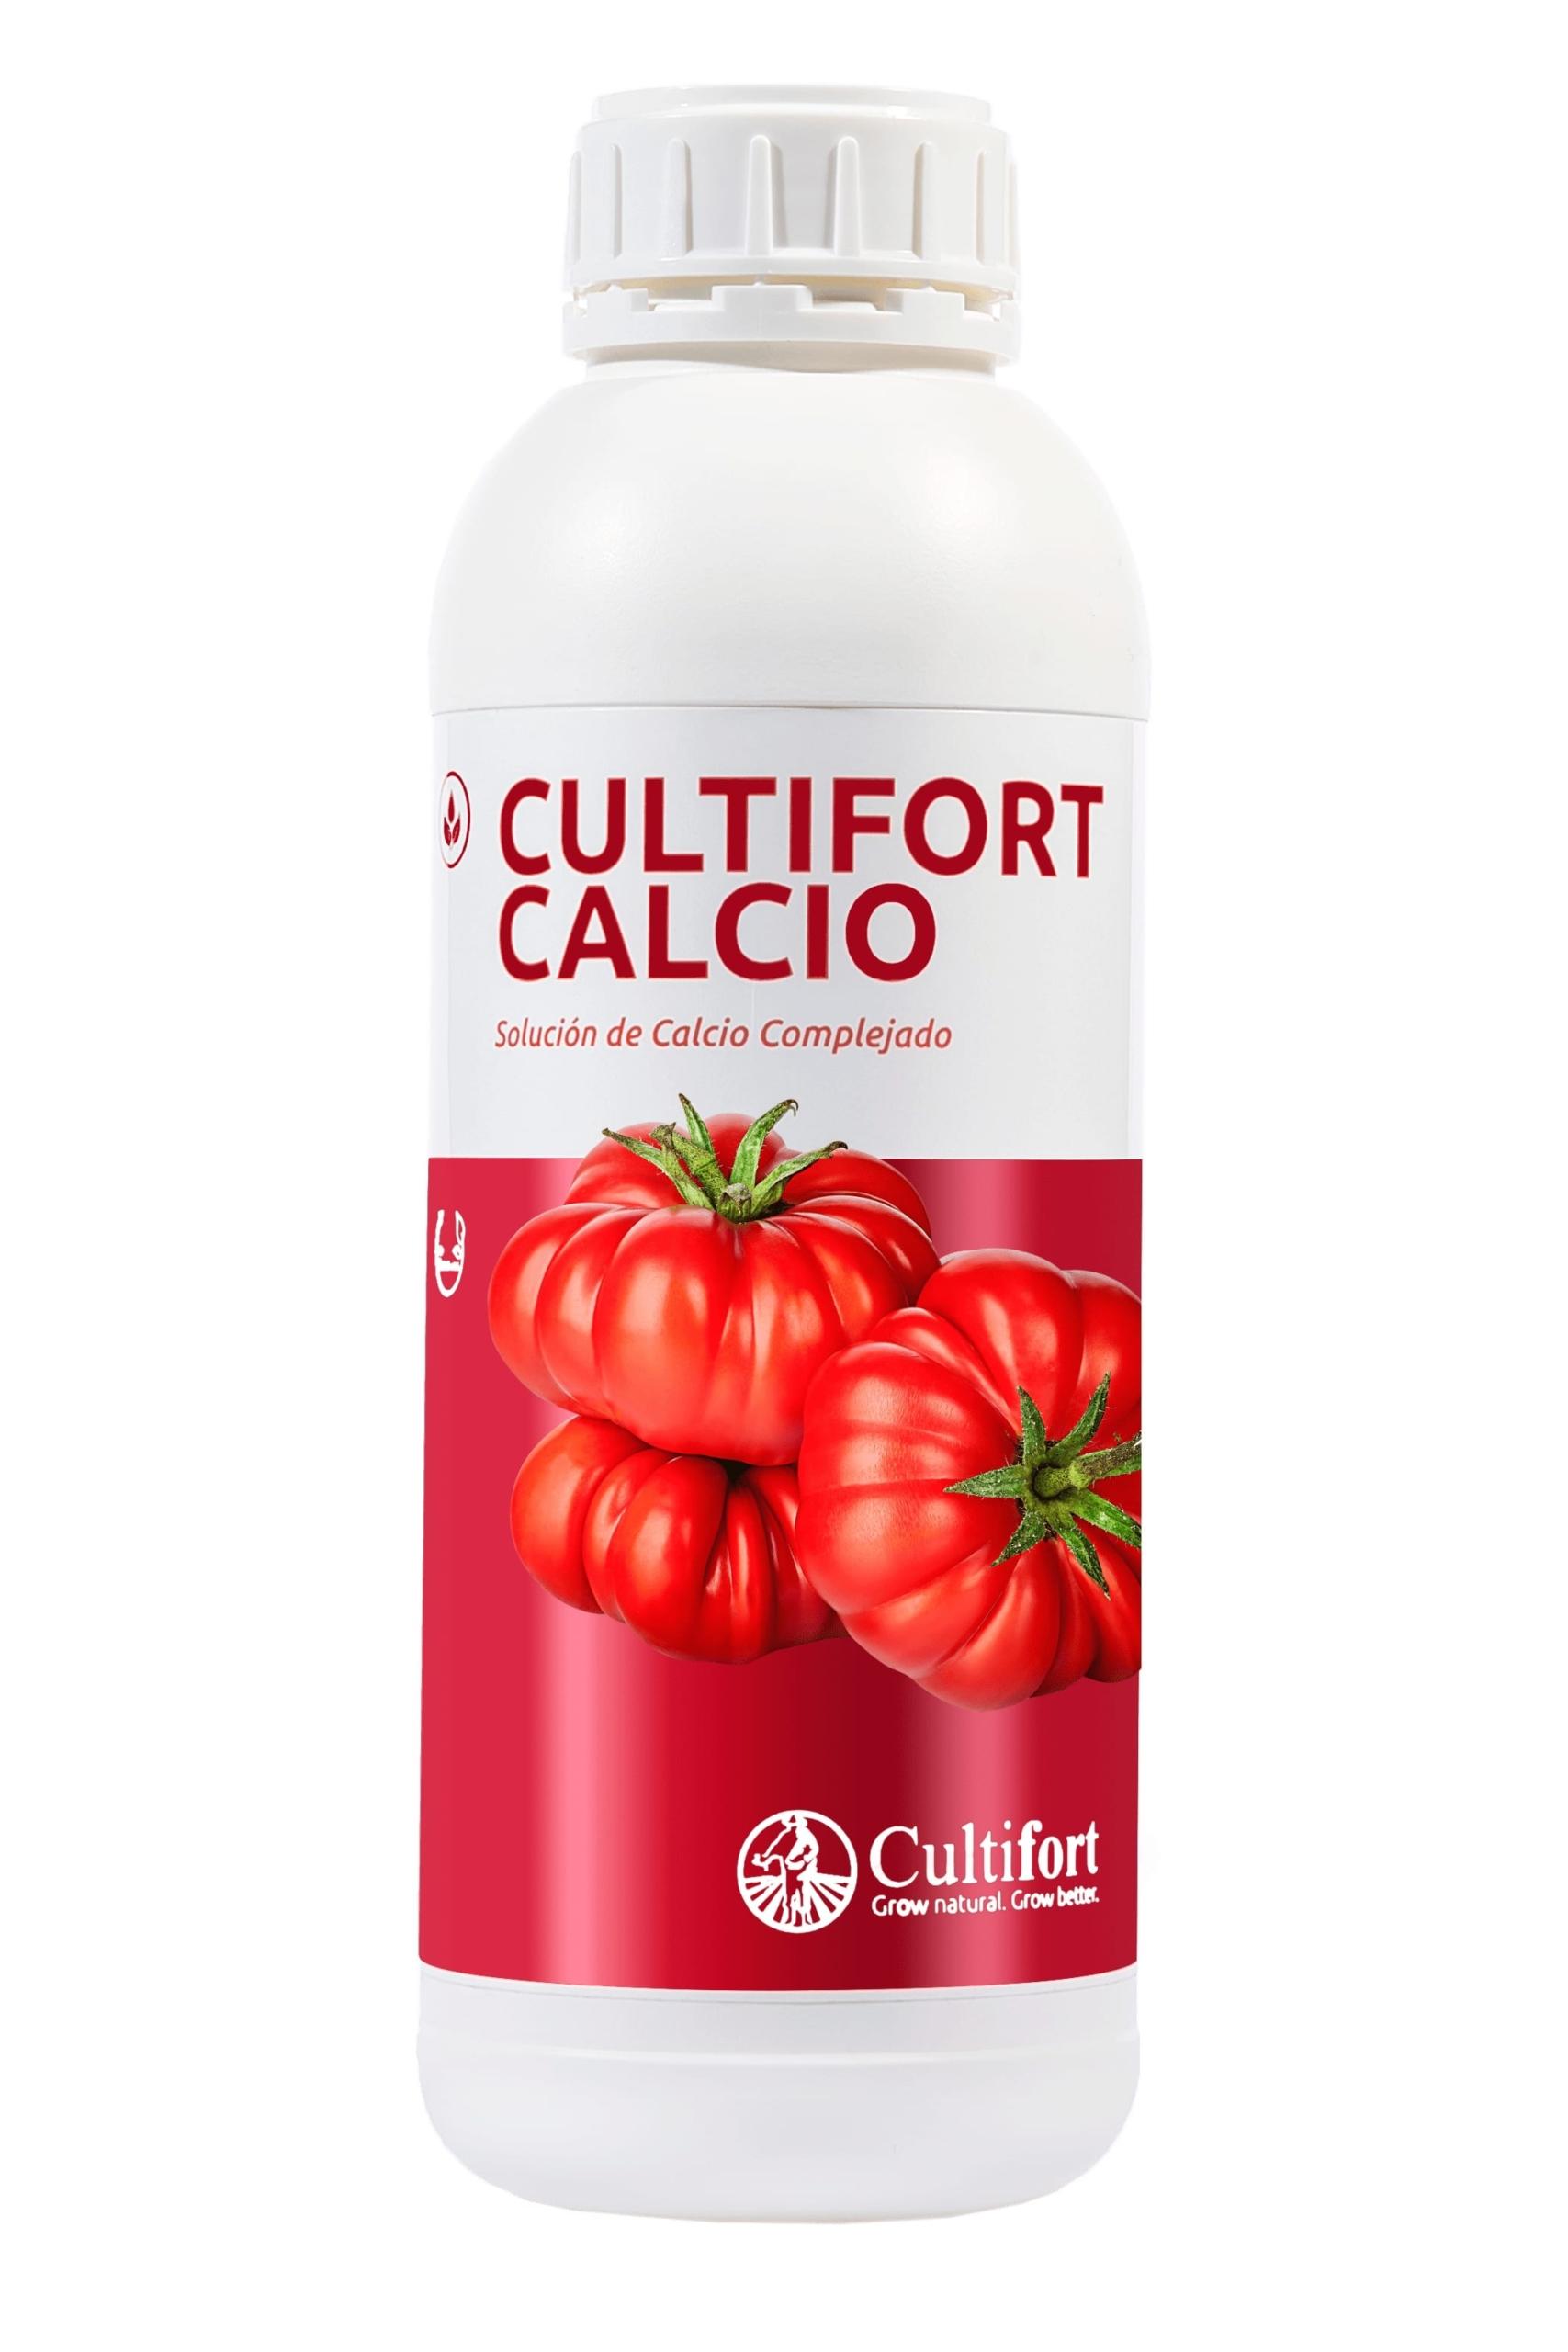 CULTIFORT CALCIO 1l